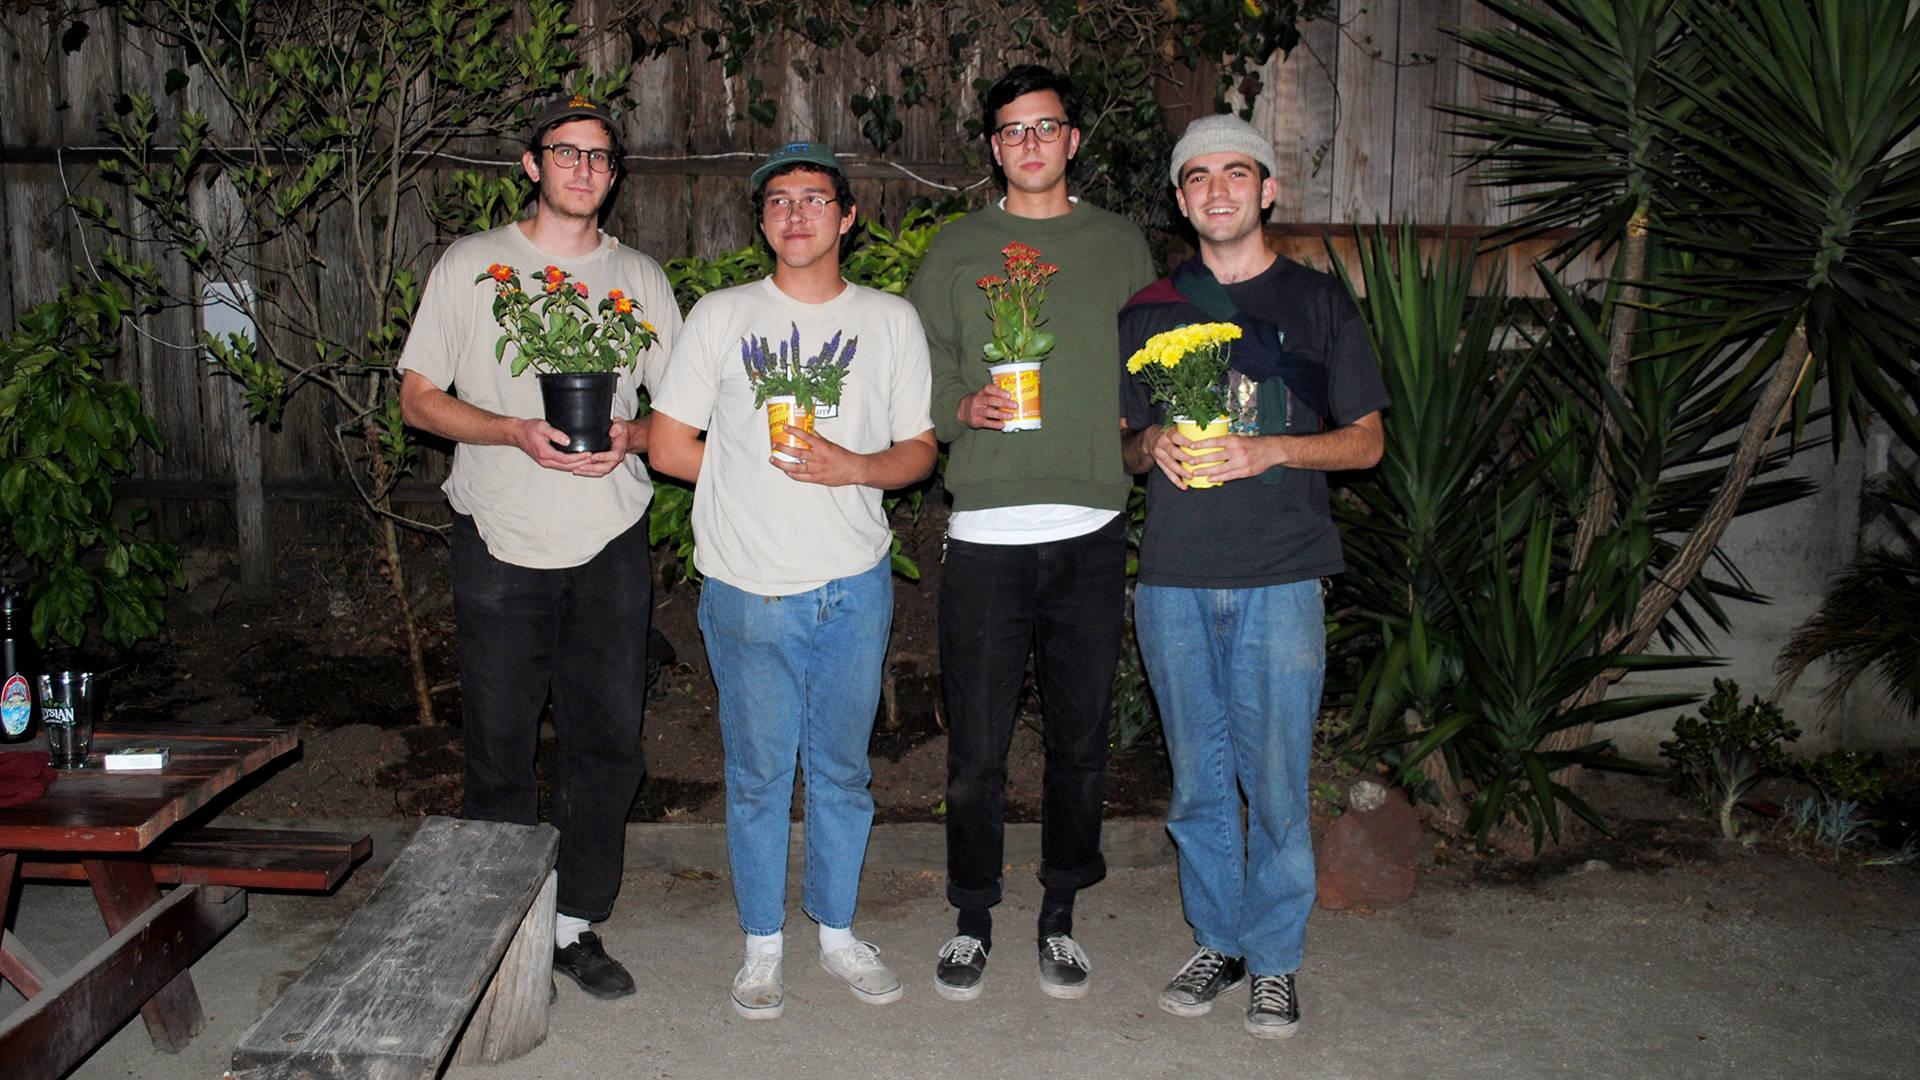 Pardoner's Trey Flanigan, Max Freeland, River Van Den Berghe, and Will Mervau (left to right) met at San Francisco State University.